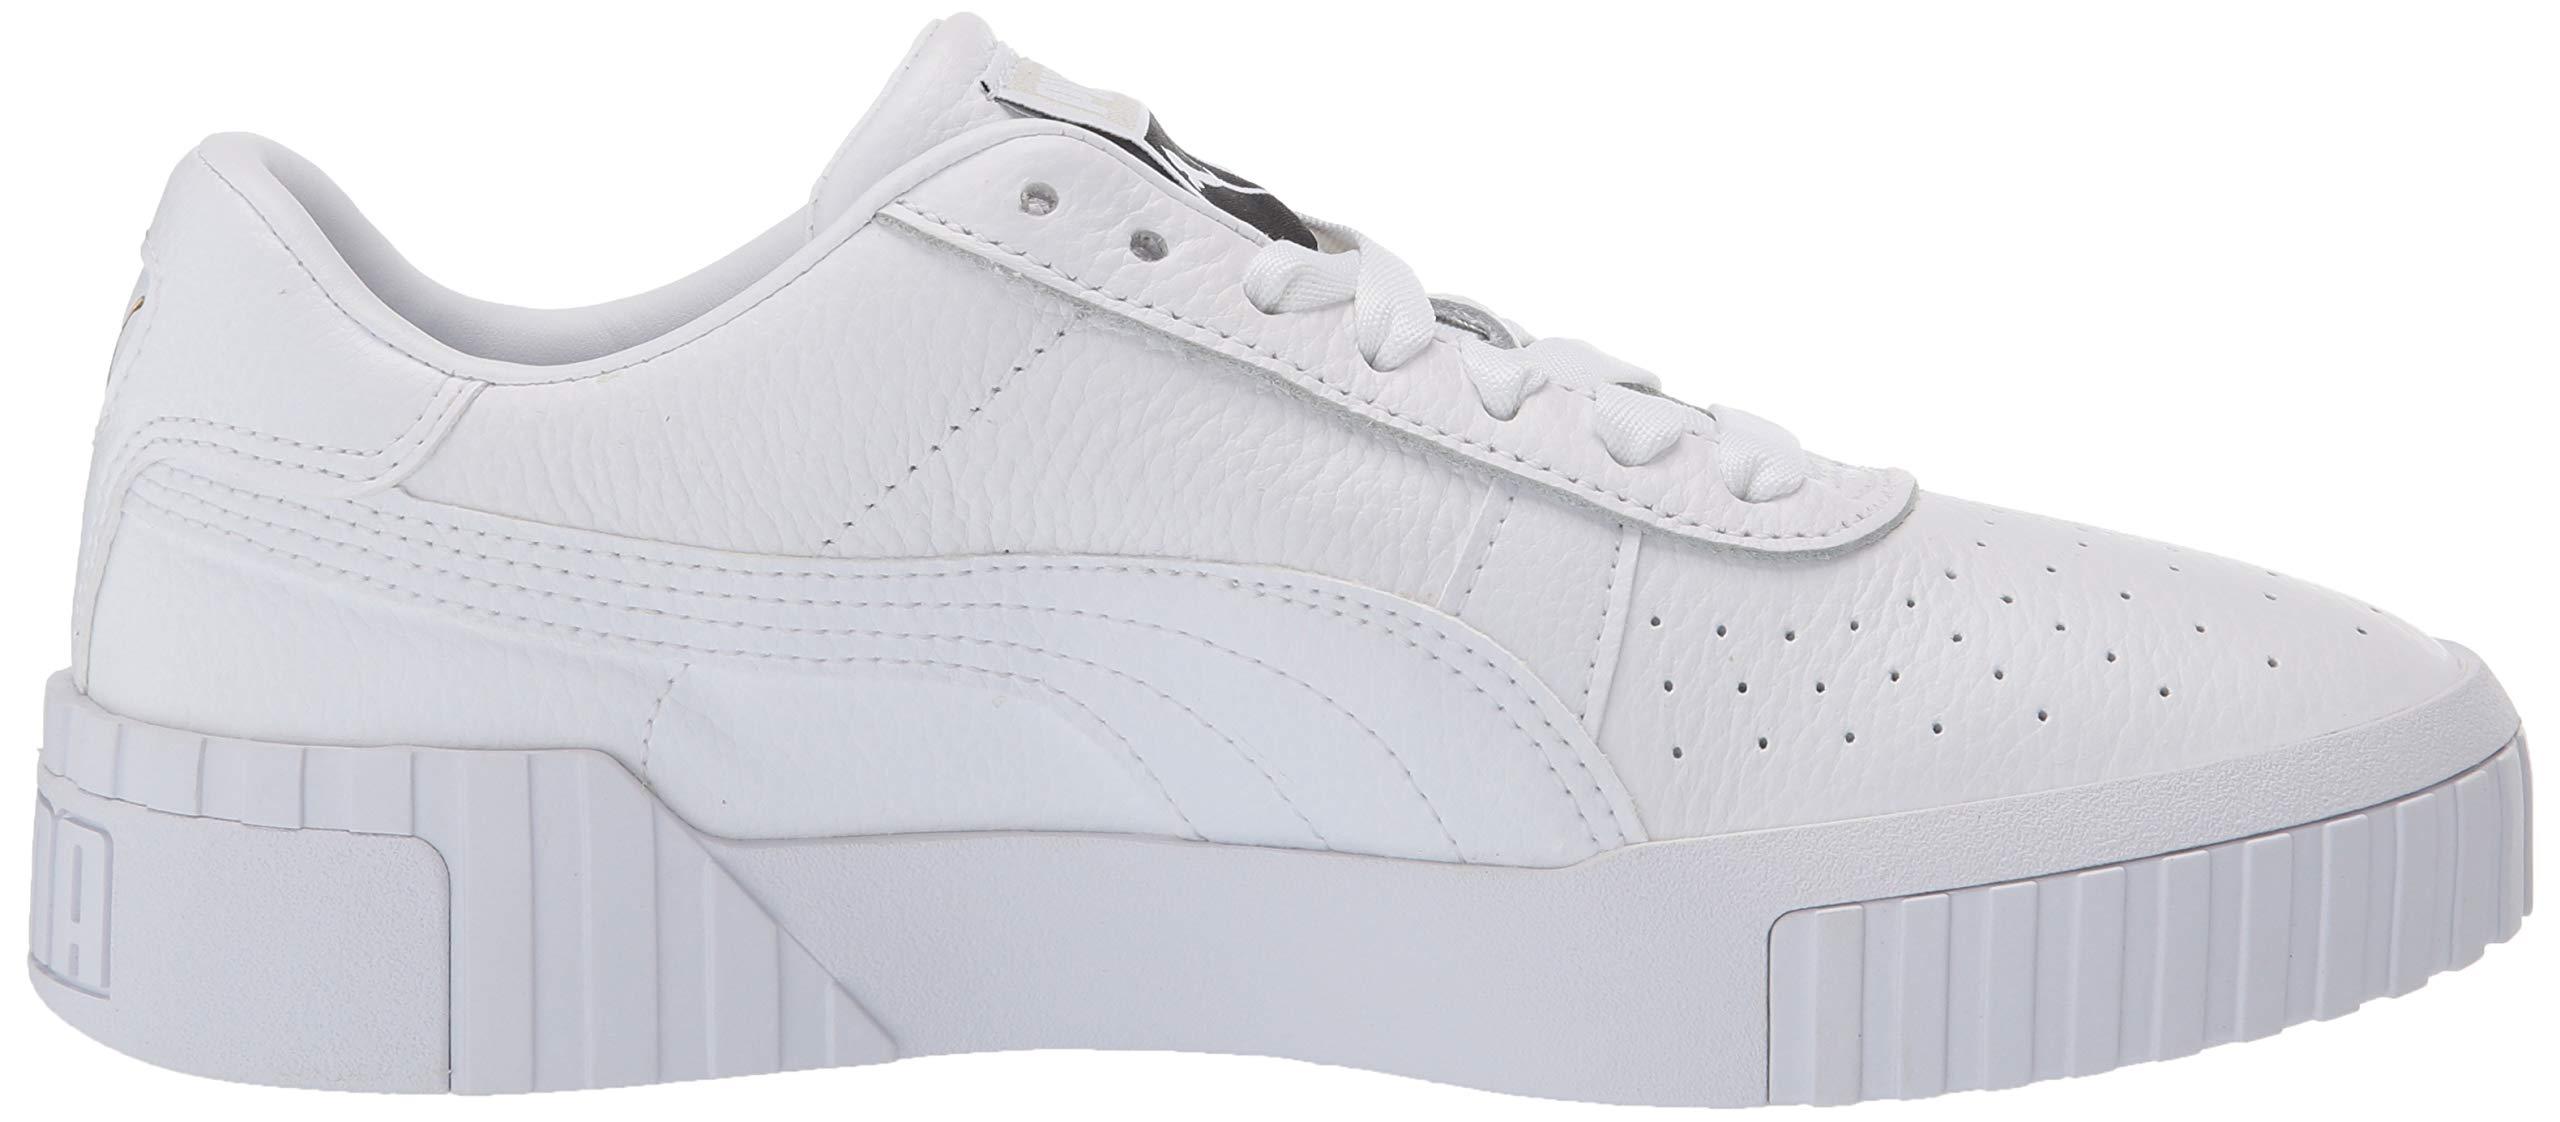 PUMA Women's CALI Sneaker, White, 9.5 M US